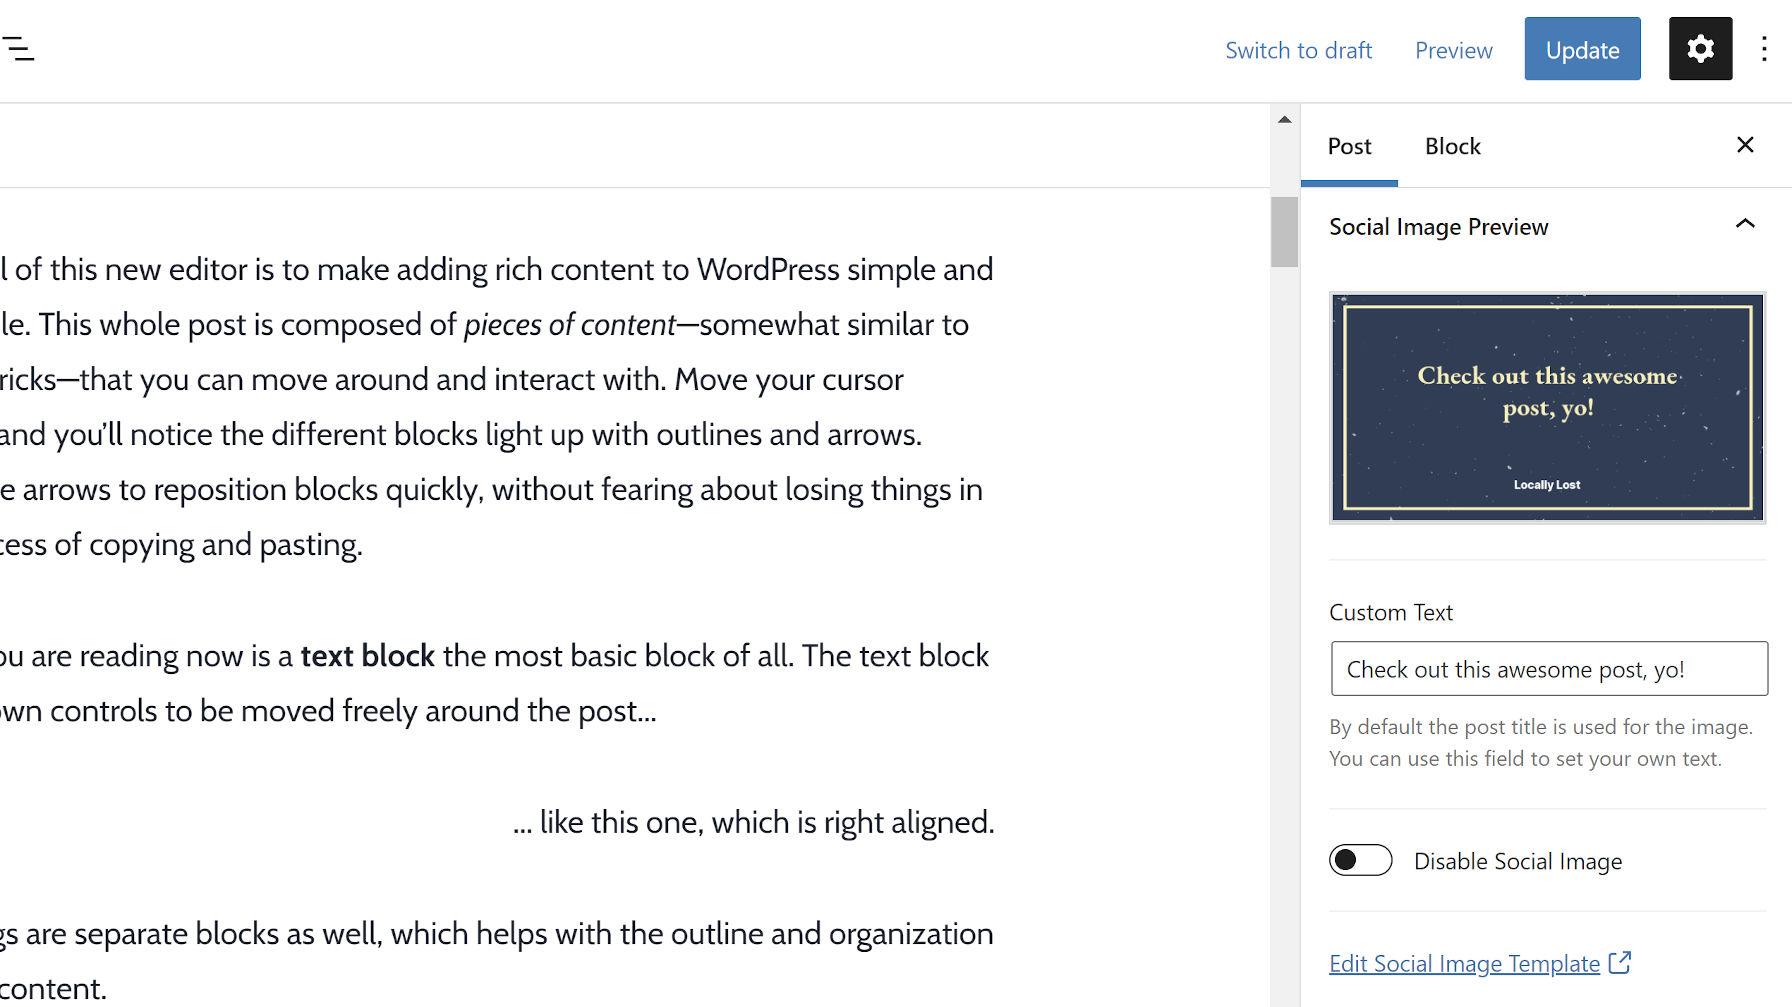 Customizing the social image via a sidebar meta box from the WordPress post editor.